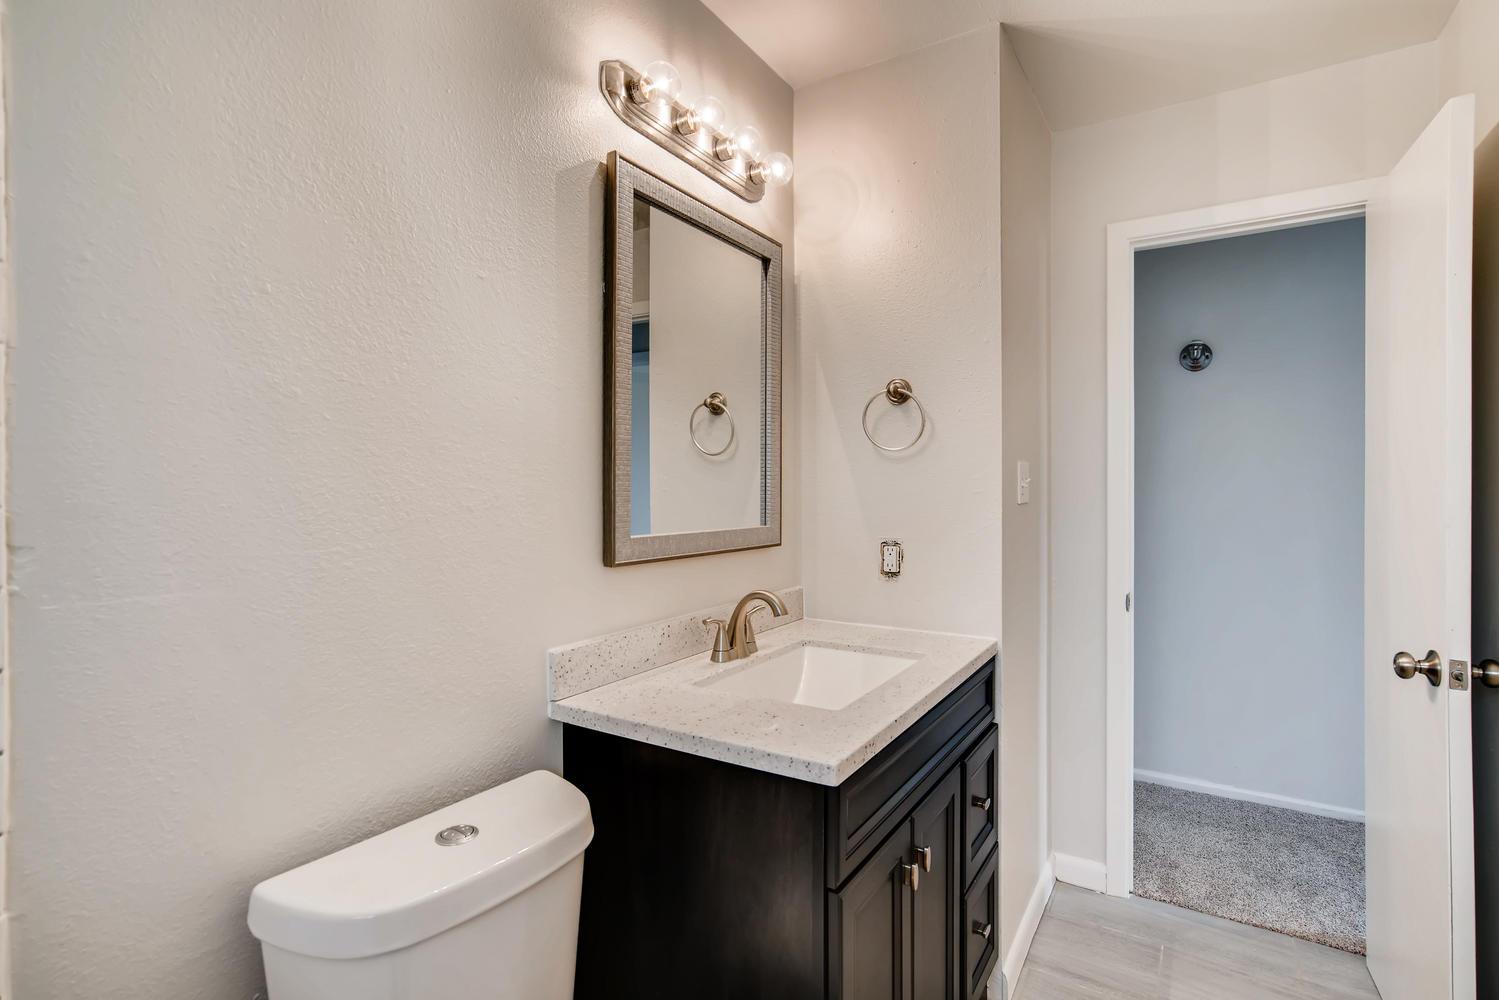 REAL ESTATE LISTING: 13040 Pensacola Place Denver NEW Main Level Bathroom